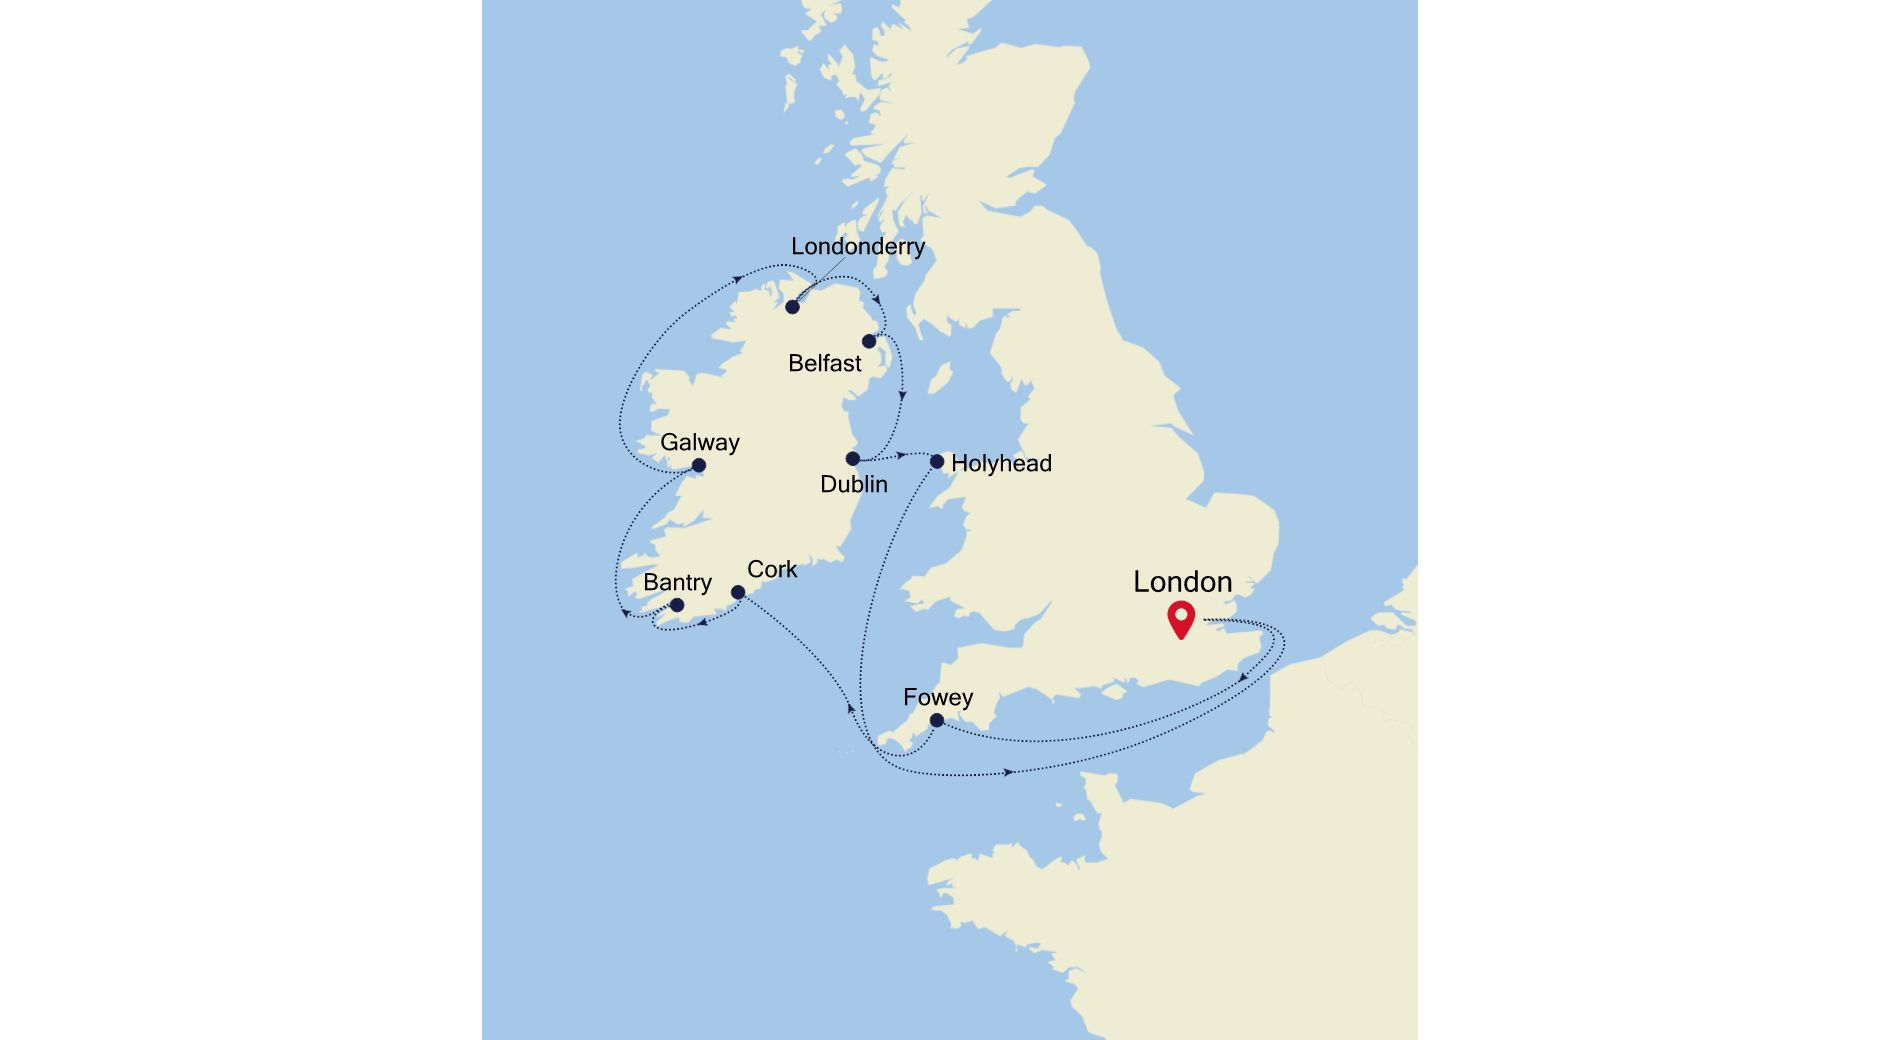 2923 - London to London